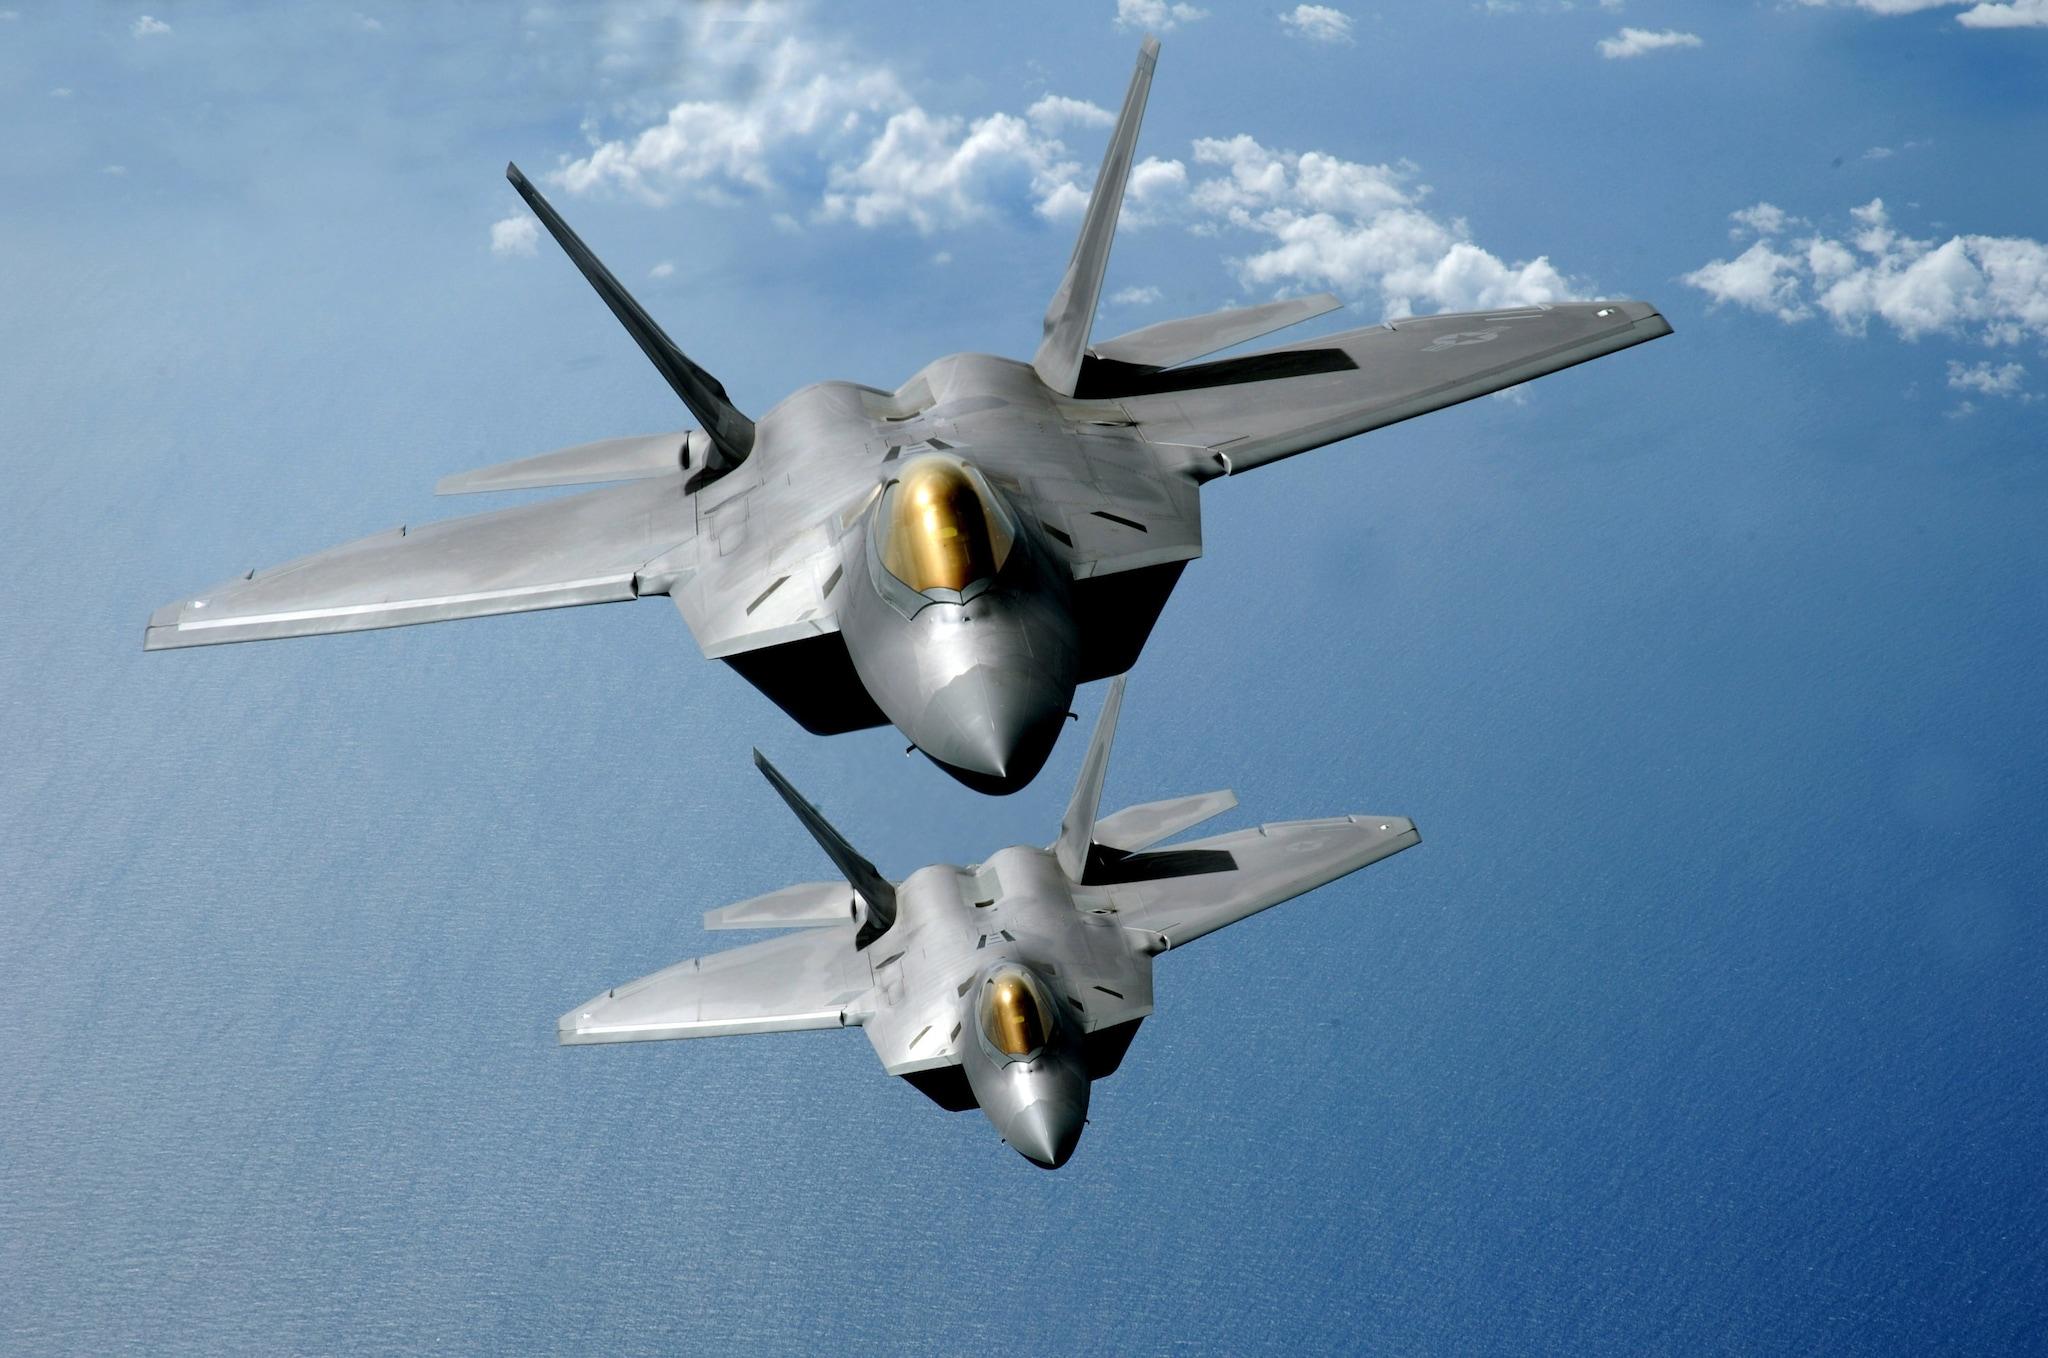 (U.S. Air Force photo/Master Sgt. Kevin J. Gruenwald)